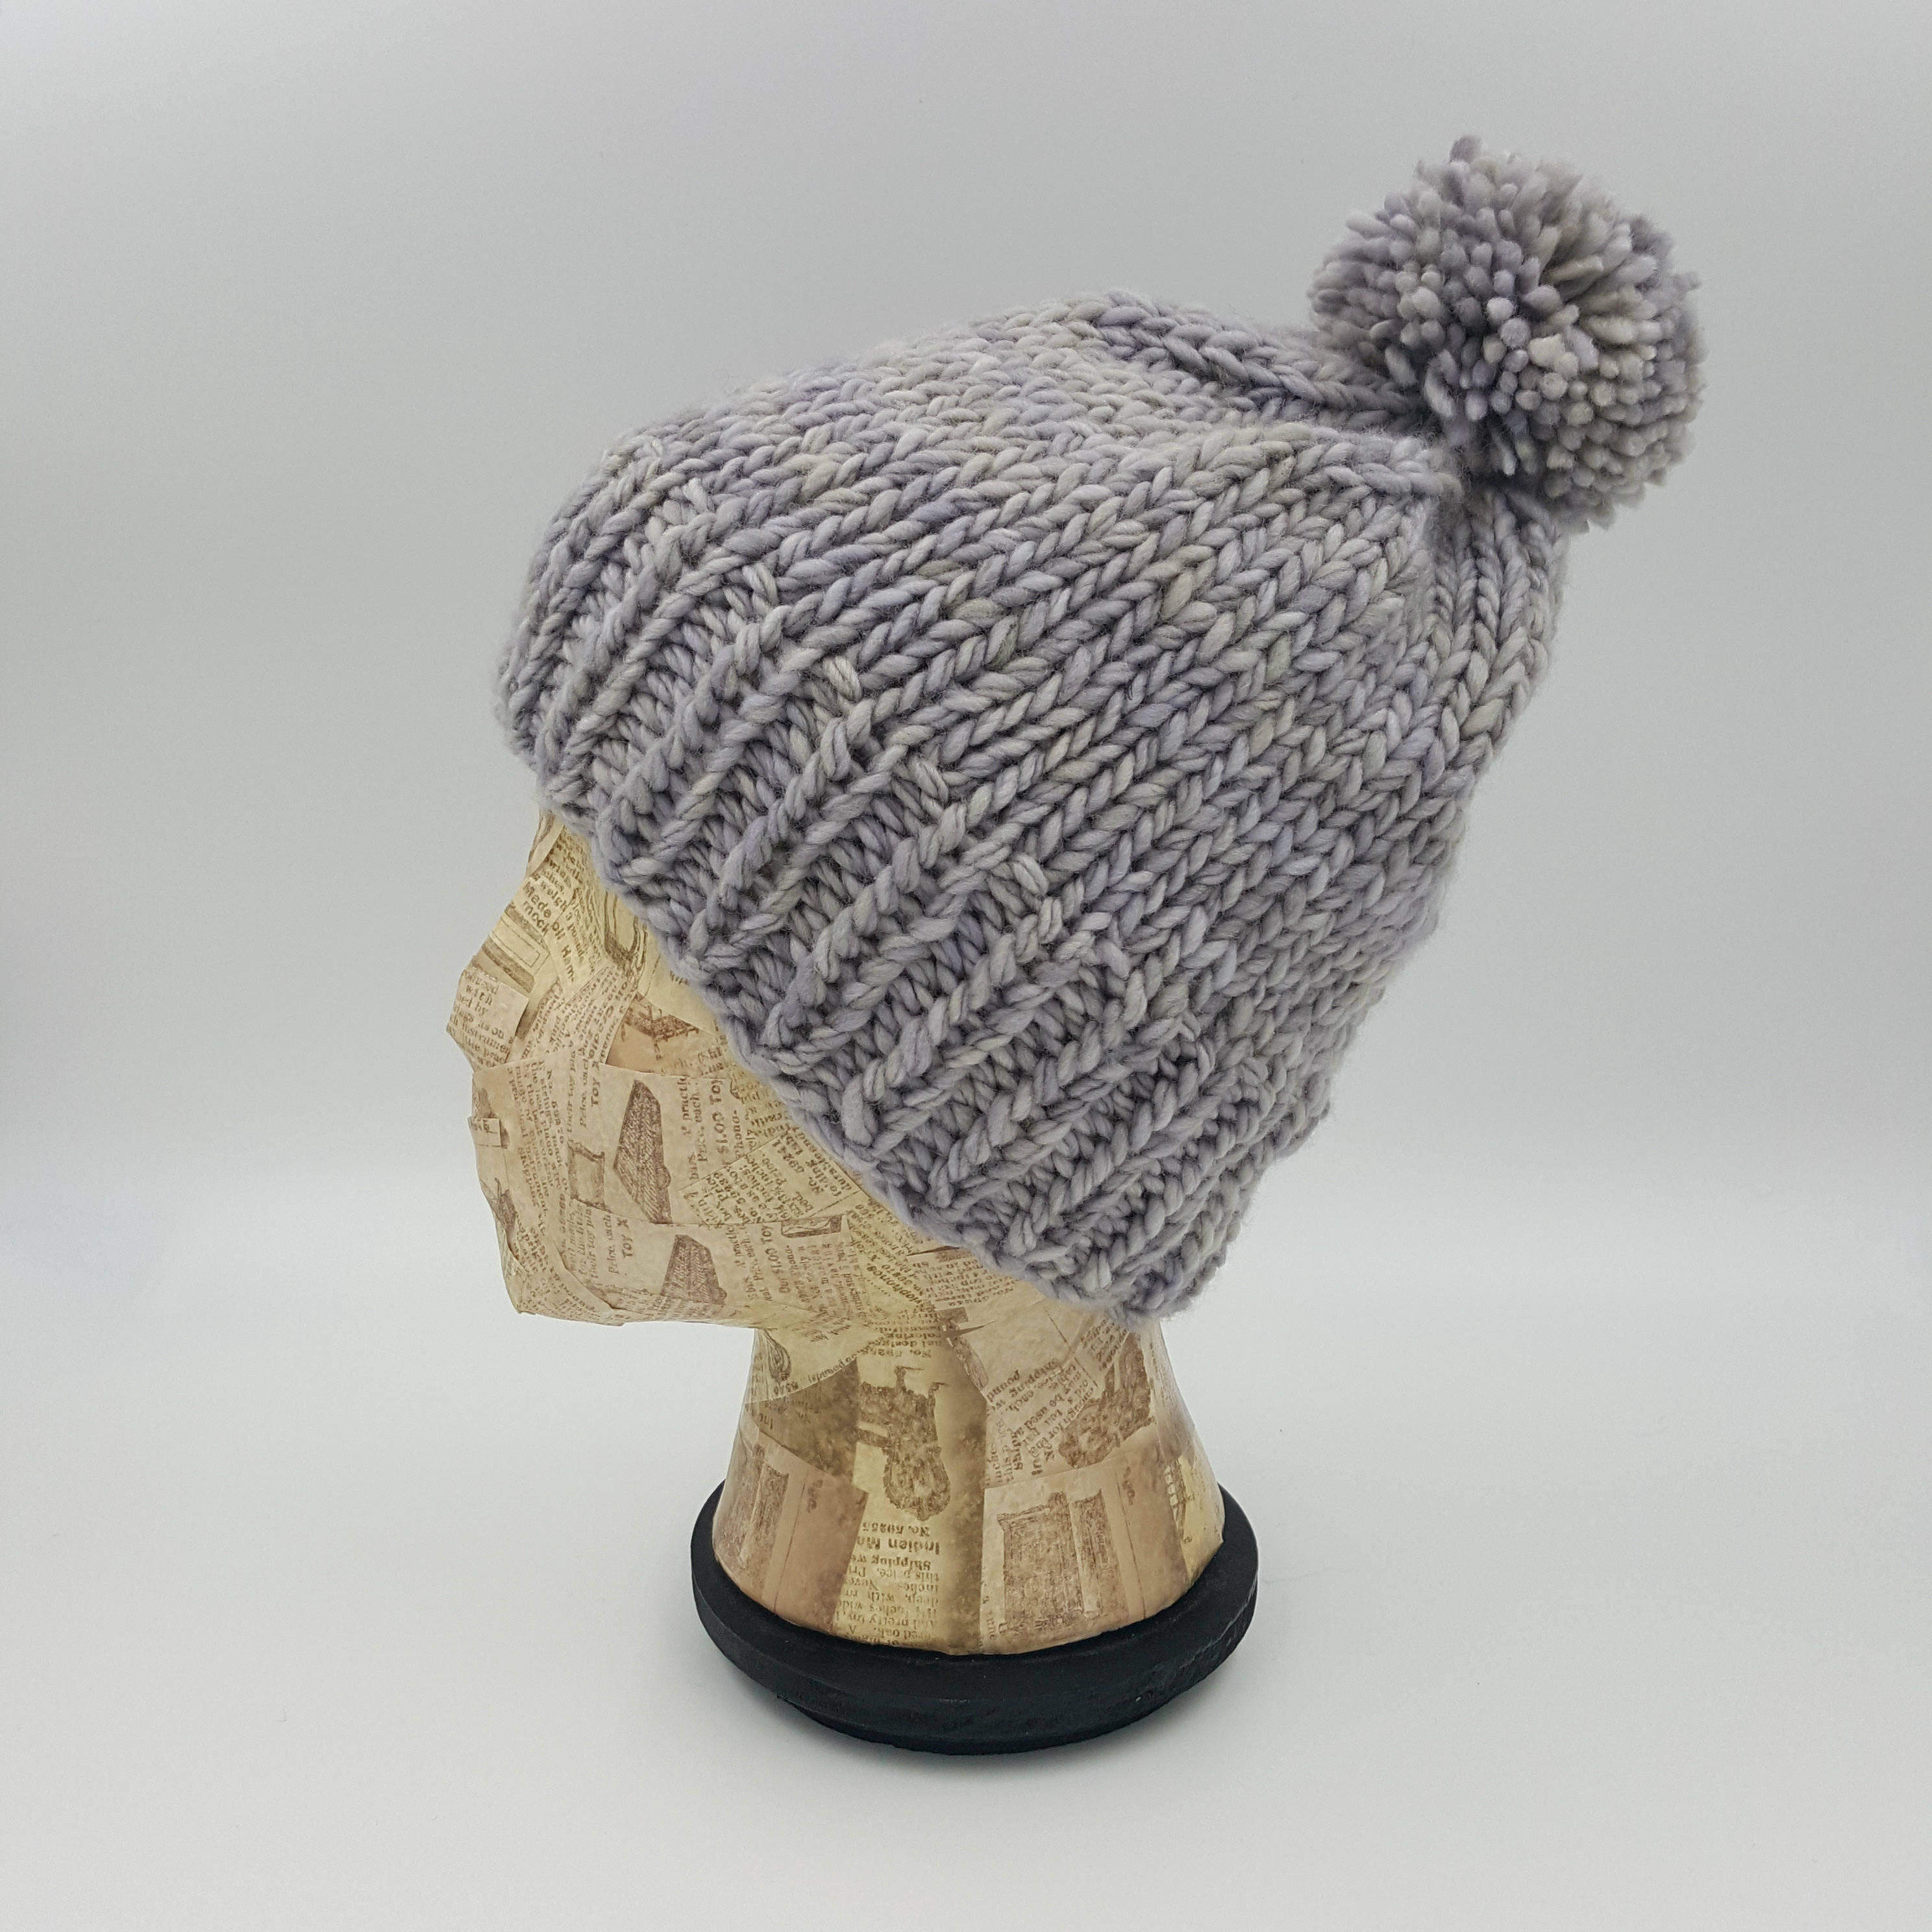 9718efef0 Fitted Beanie, Pom Pom Beanie, Hand Knit Hat, Light Grey Beanie, Winter  Hat, Hat for Women, Wool Hat, Merino Wool Beanie, Gray Beanie